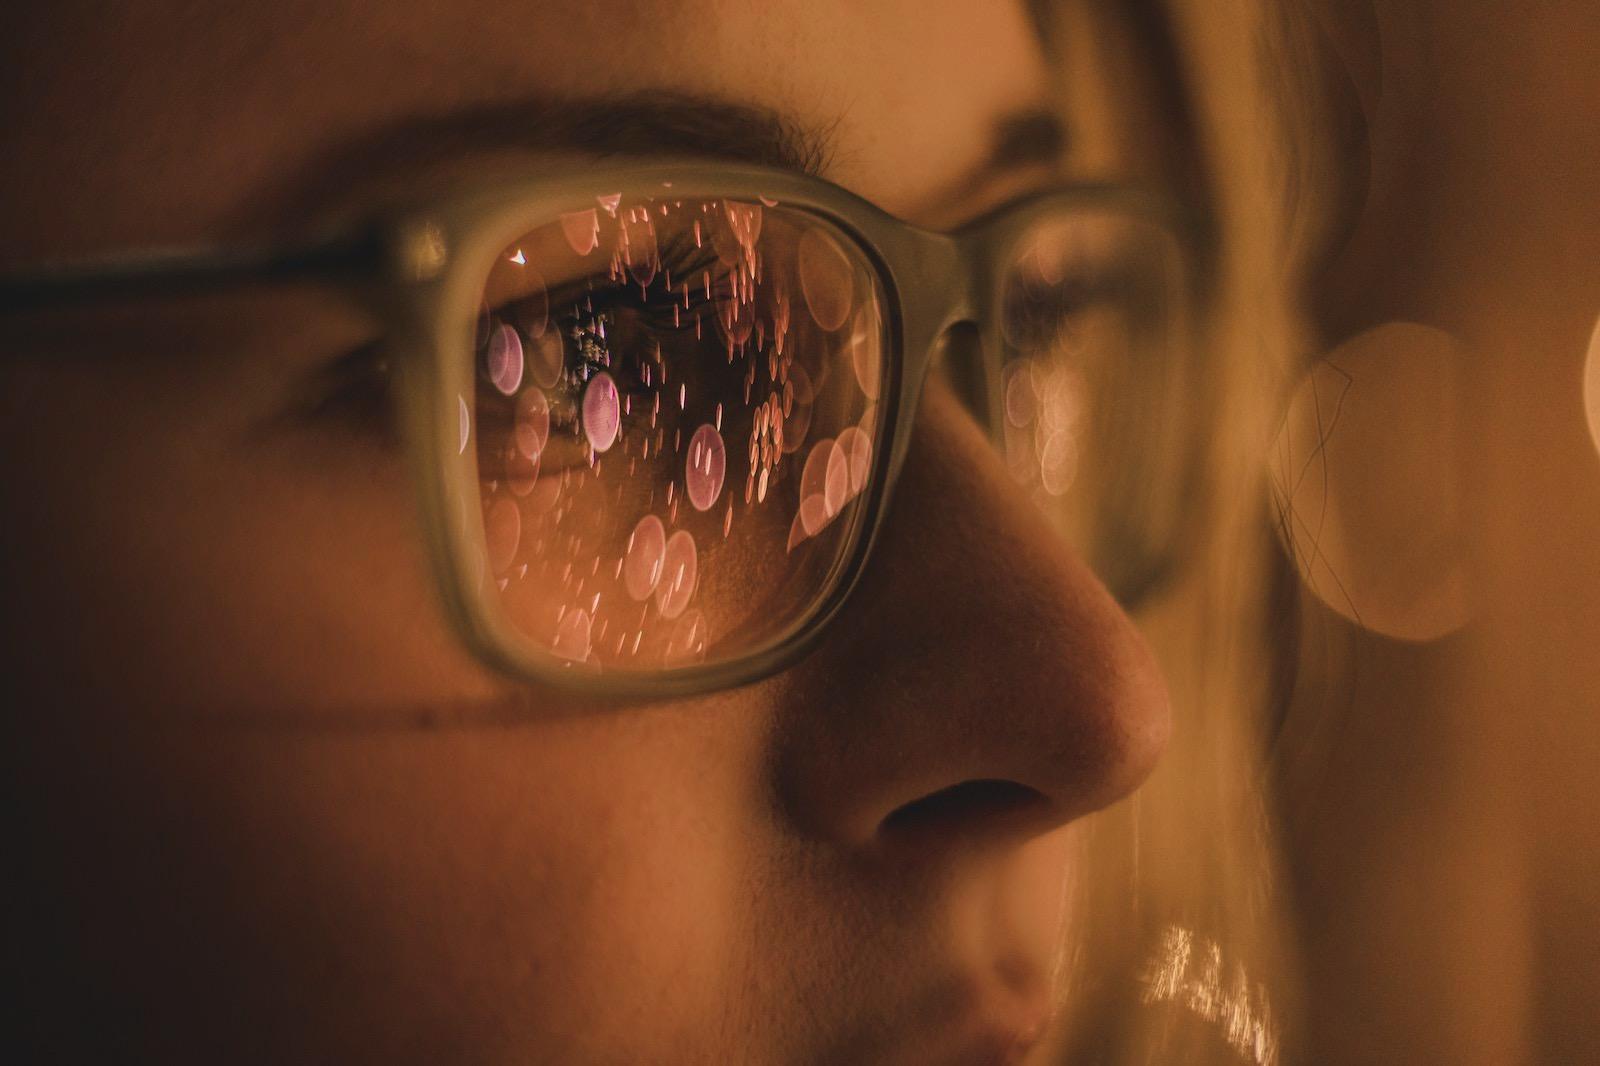 Christian wiediger 1210801 unsplash glasses with sci fi taste